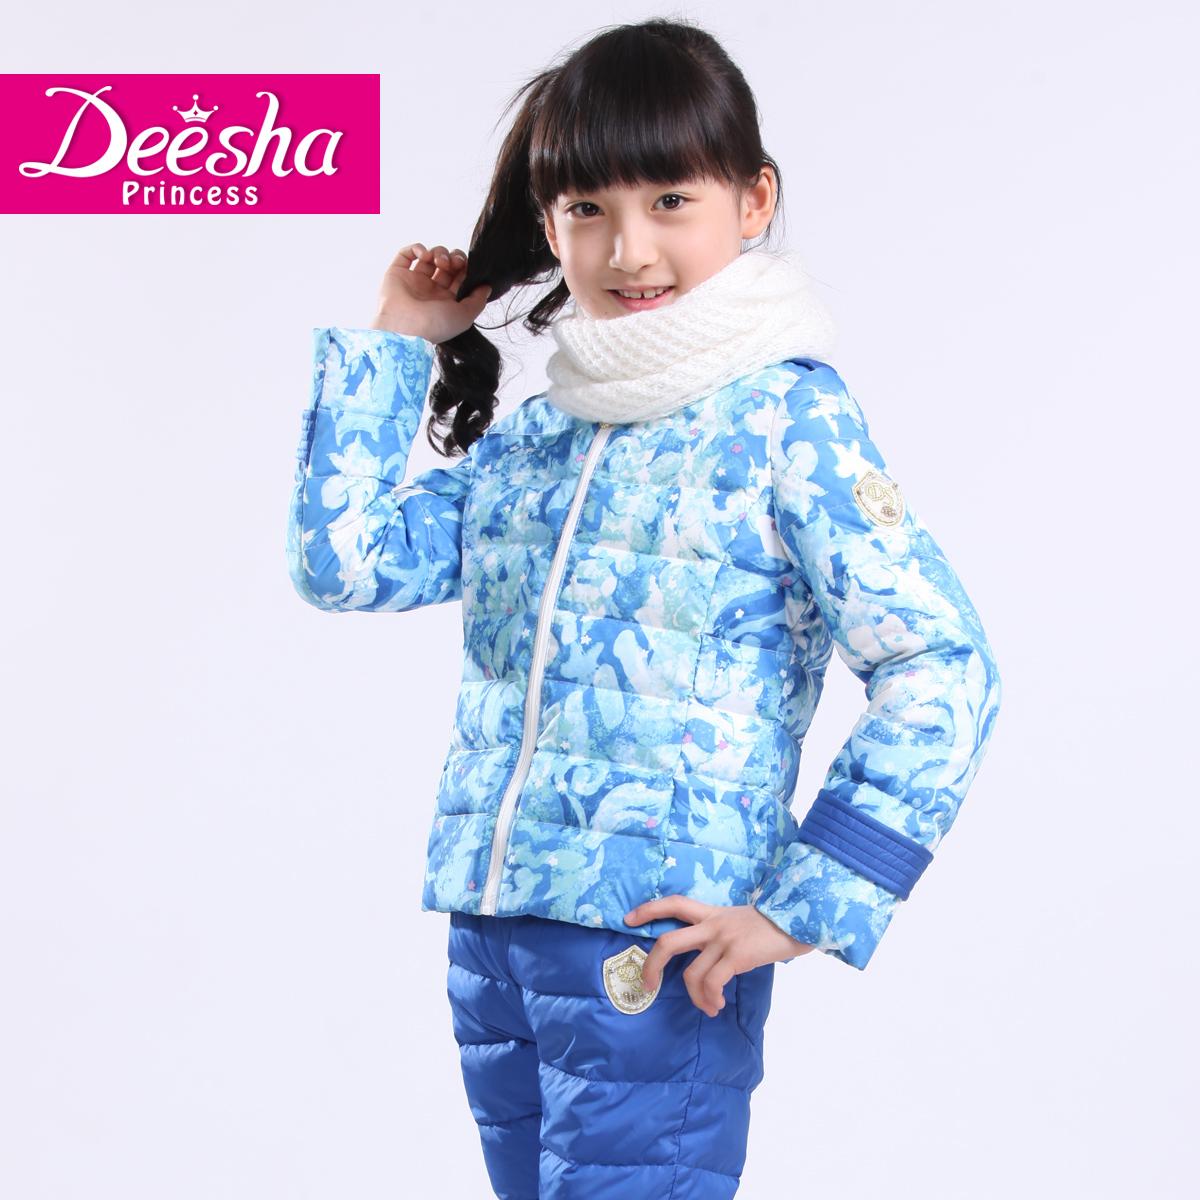 disha笛莎女儿童冬装2014新款迪莎公主笛沙中大童印花短款羽绒服